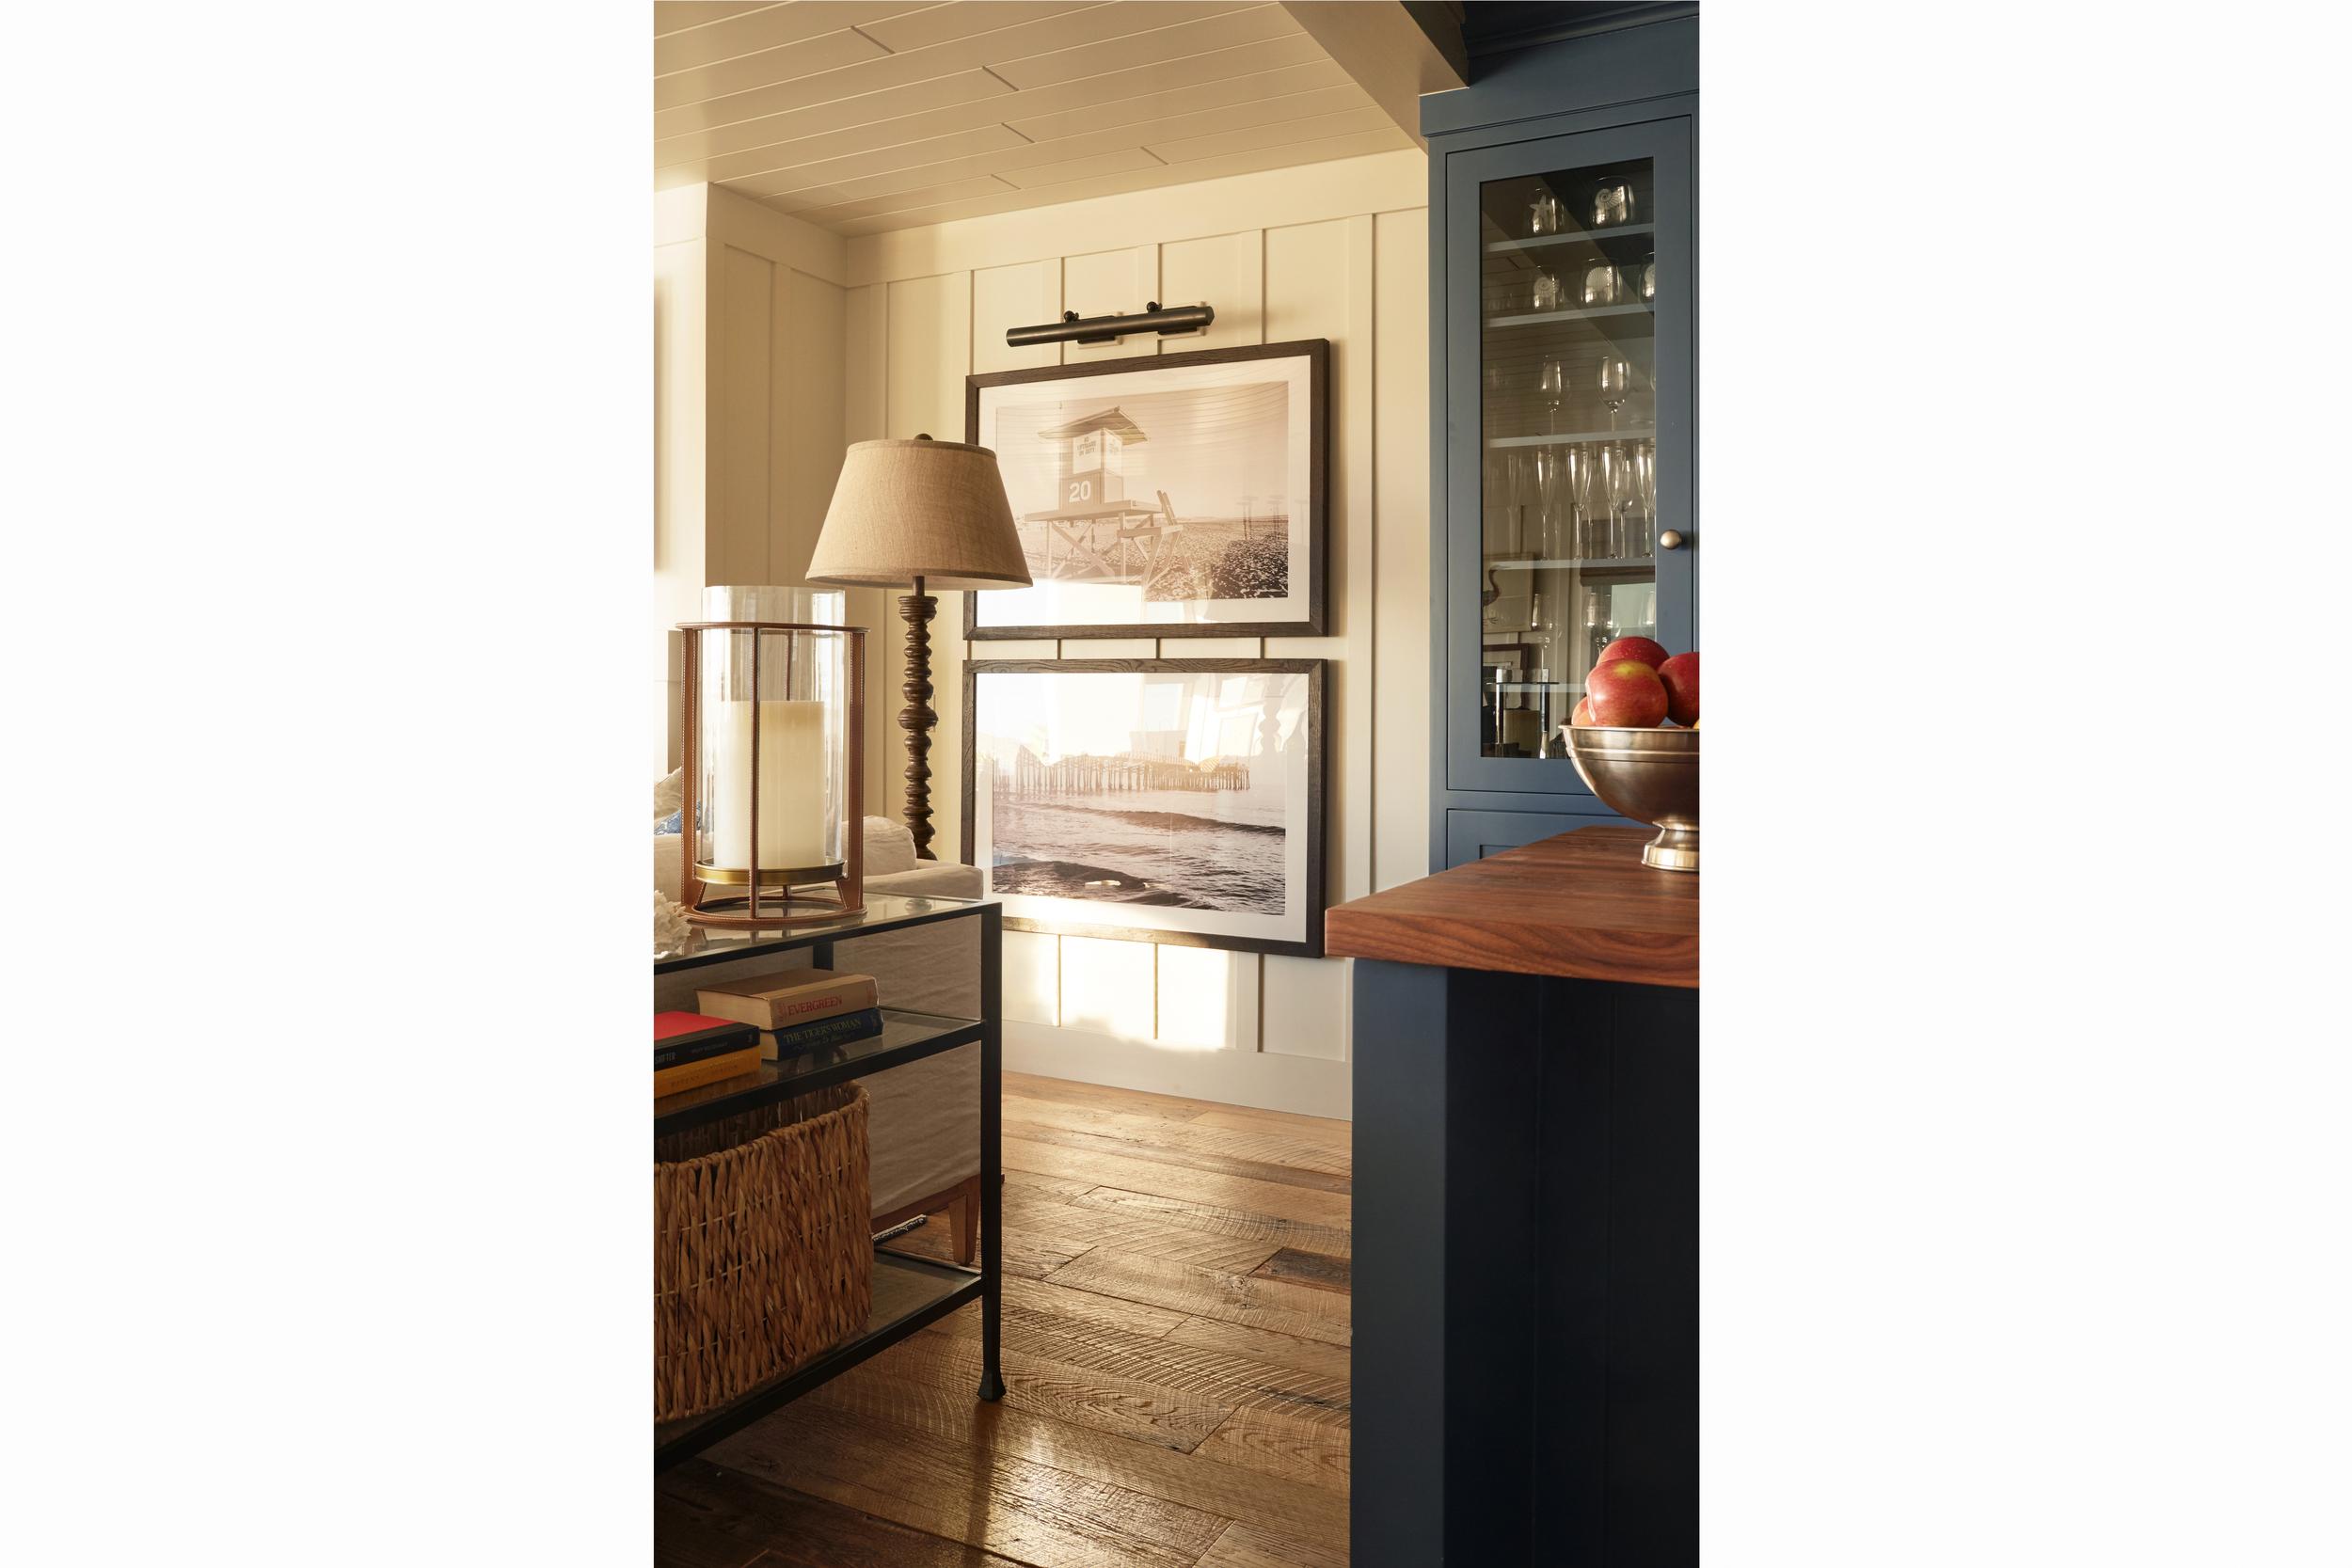 newport beach interior designer brittany stiles blue nautical.jpg